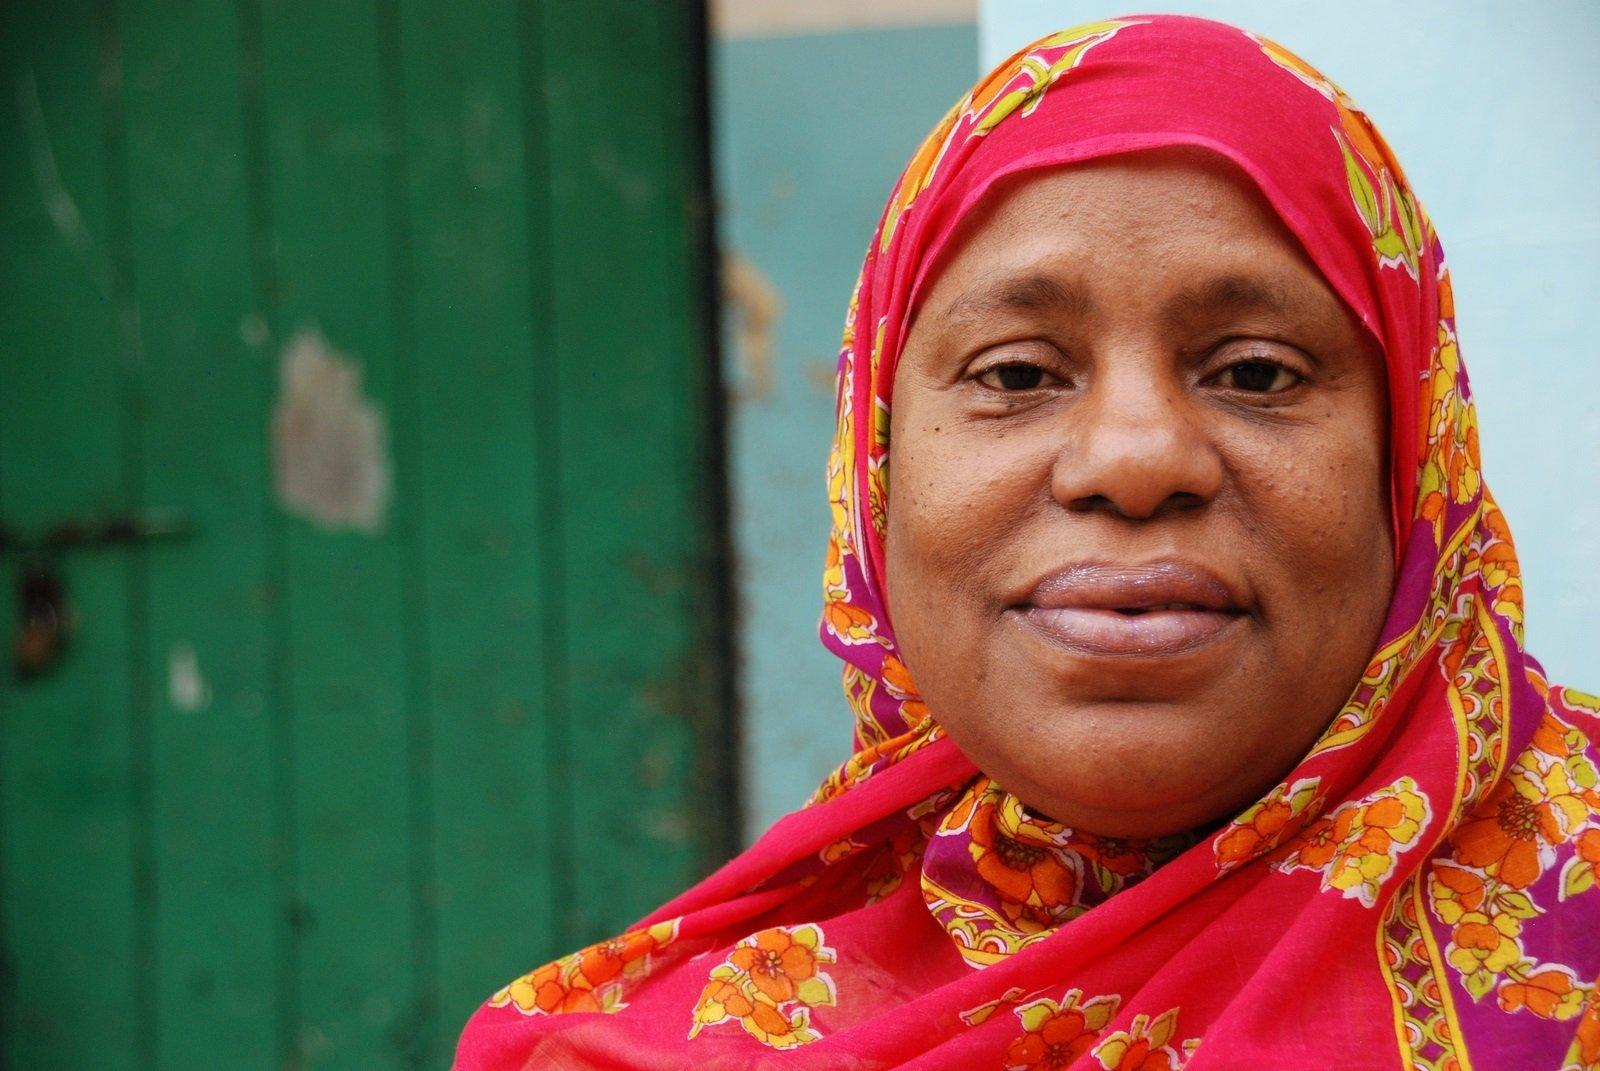 Asma Jabir, Head Teacher at Bondeni Primary School, Mombasa